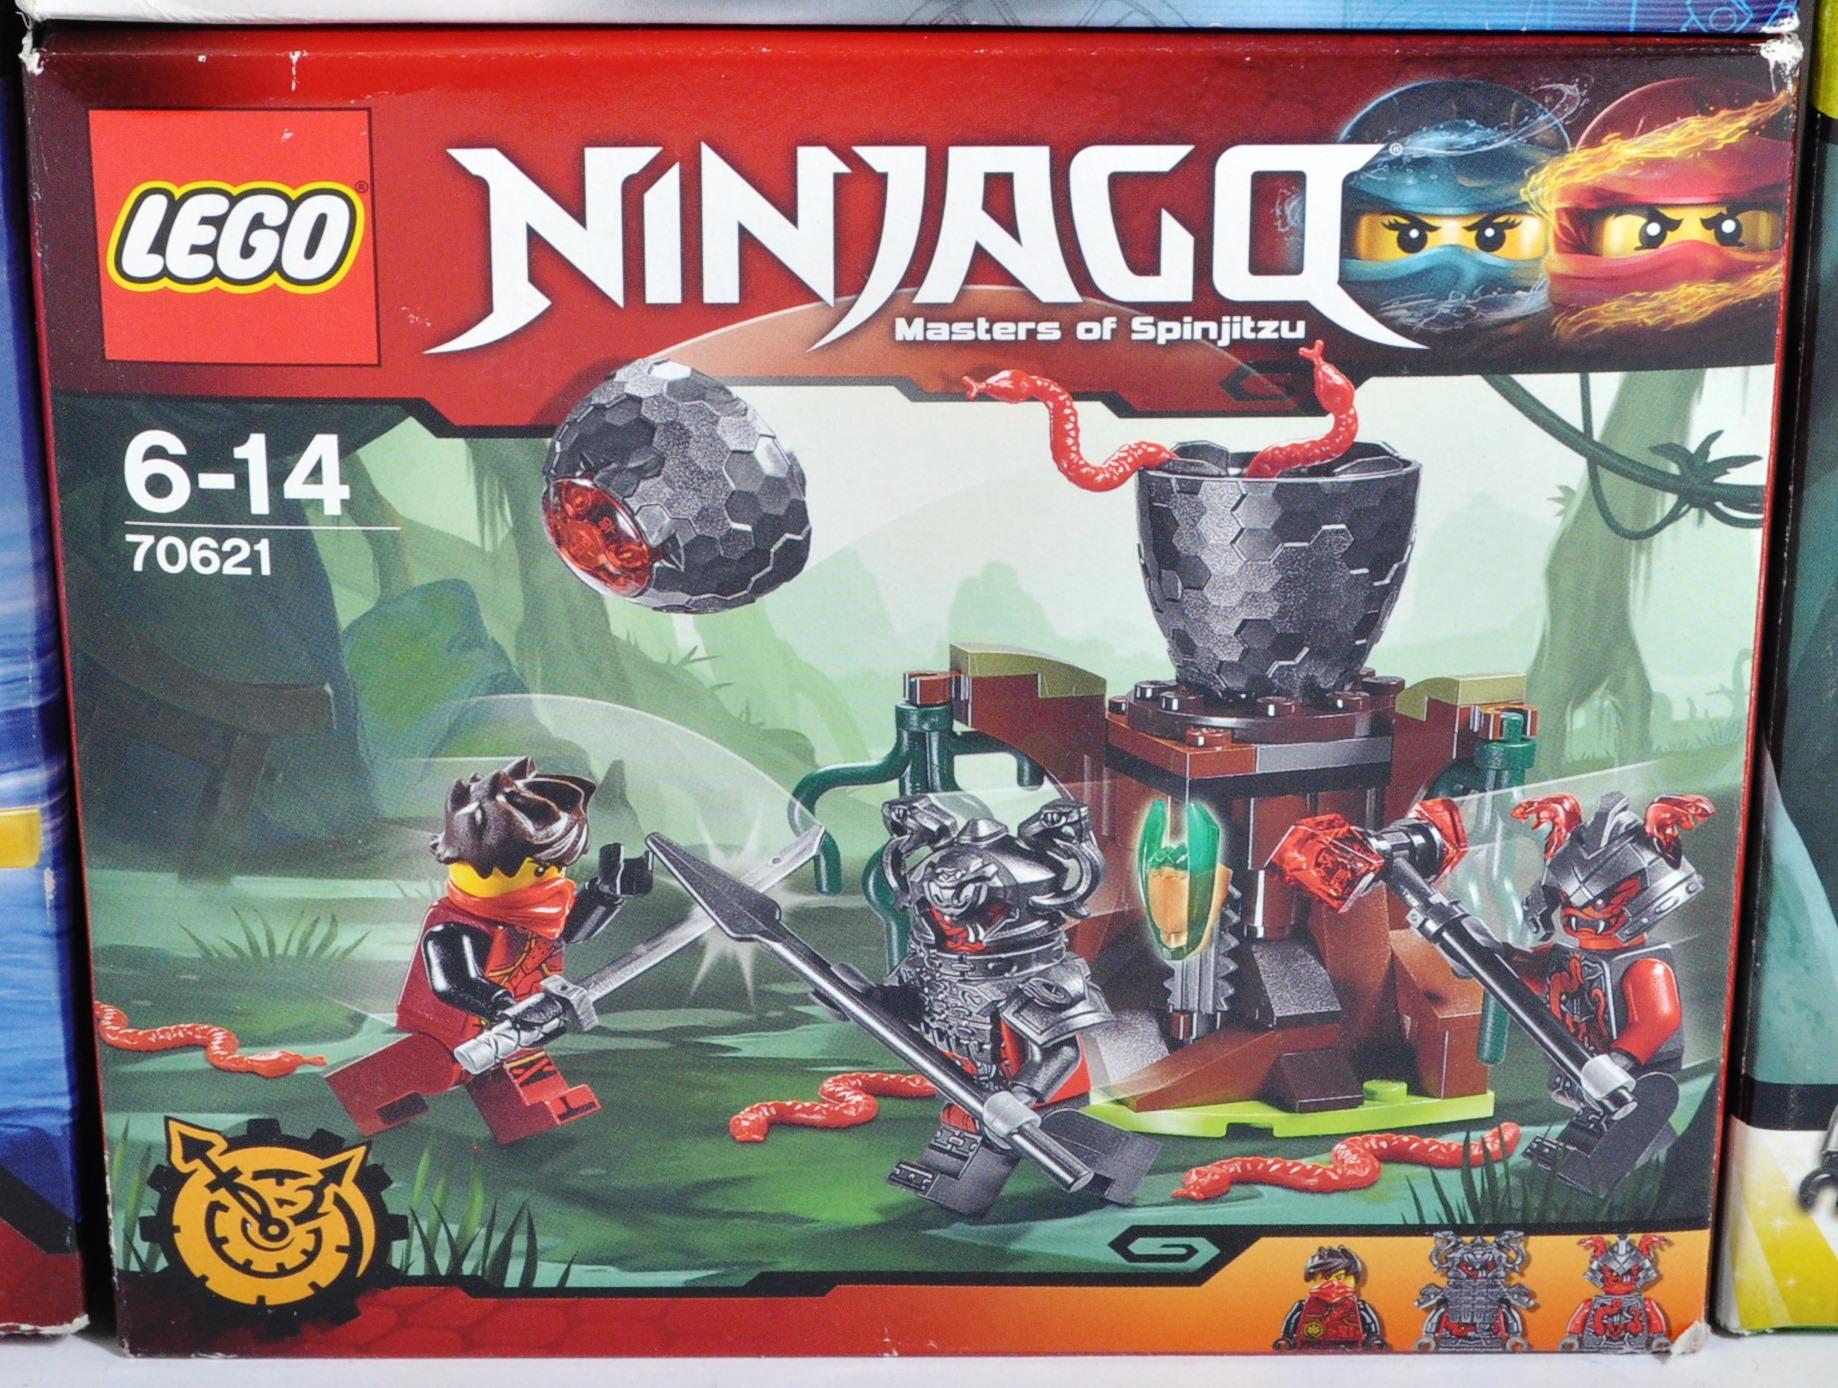 LEGO SETS - LEGO NINJAGO - COLLECTION OF X8 LEGO NINJAGO SETS - Image 8 of 9